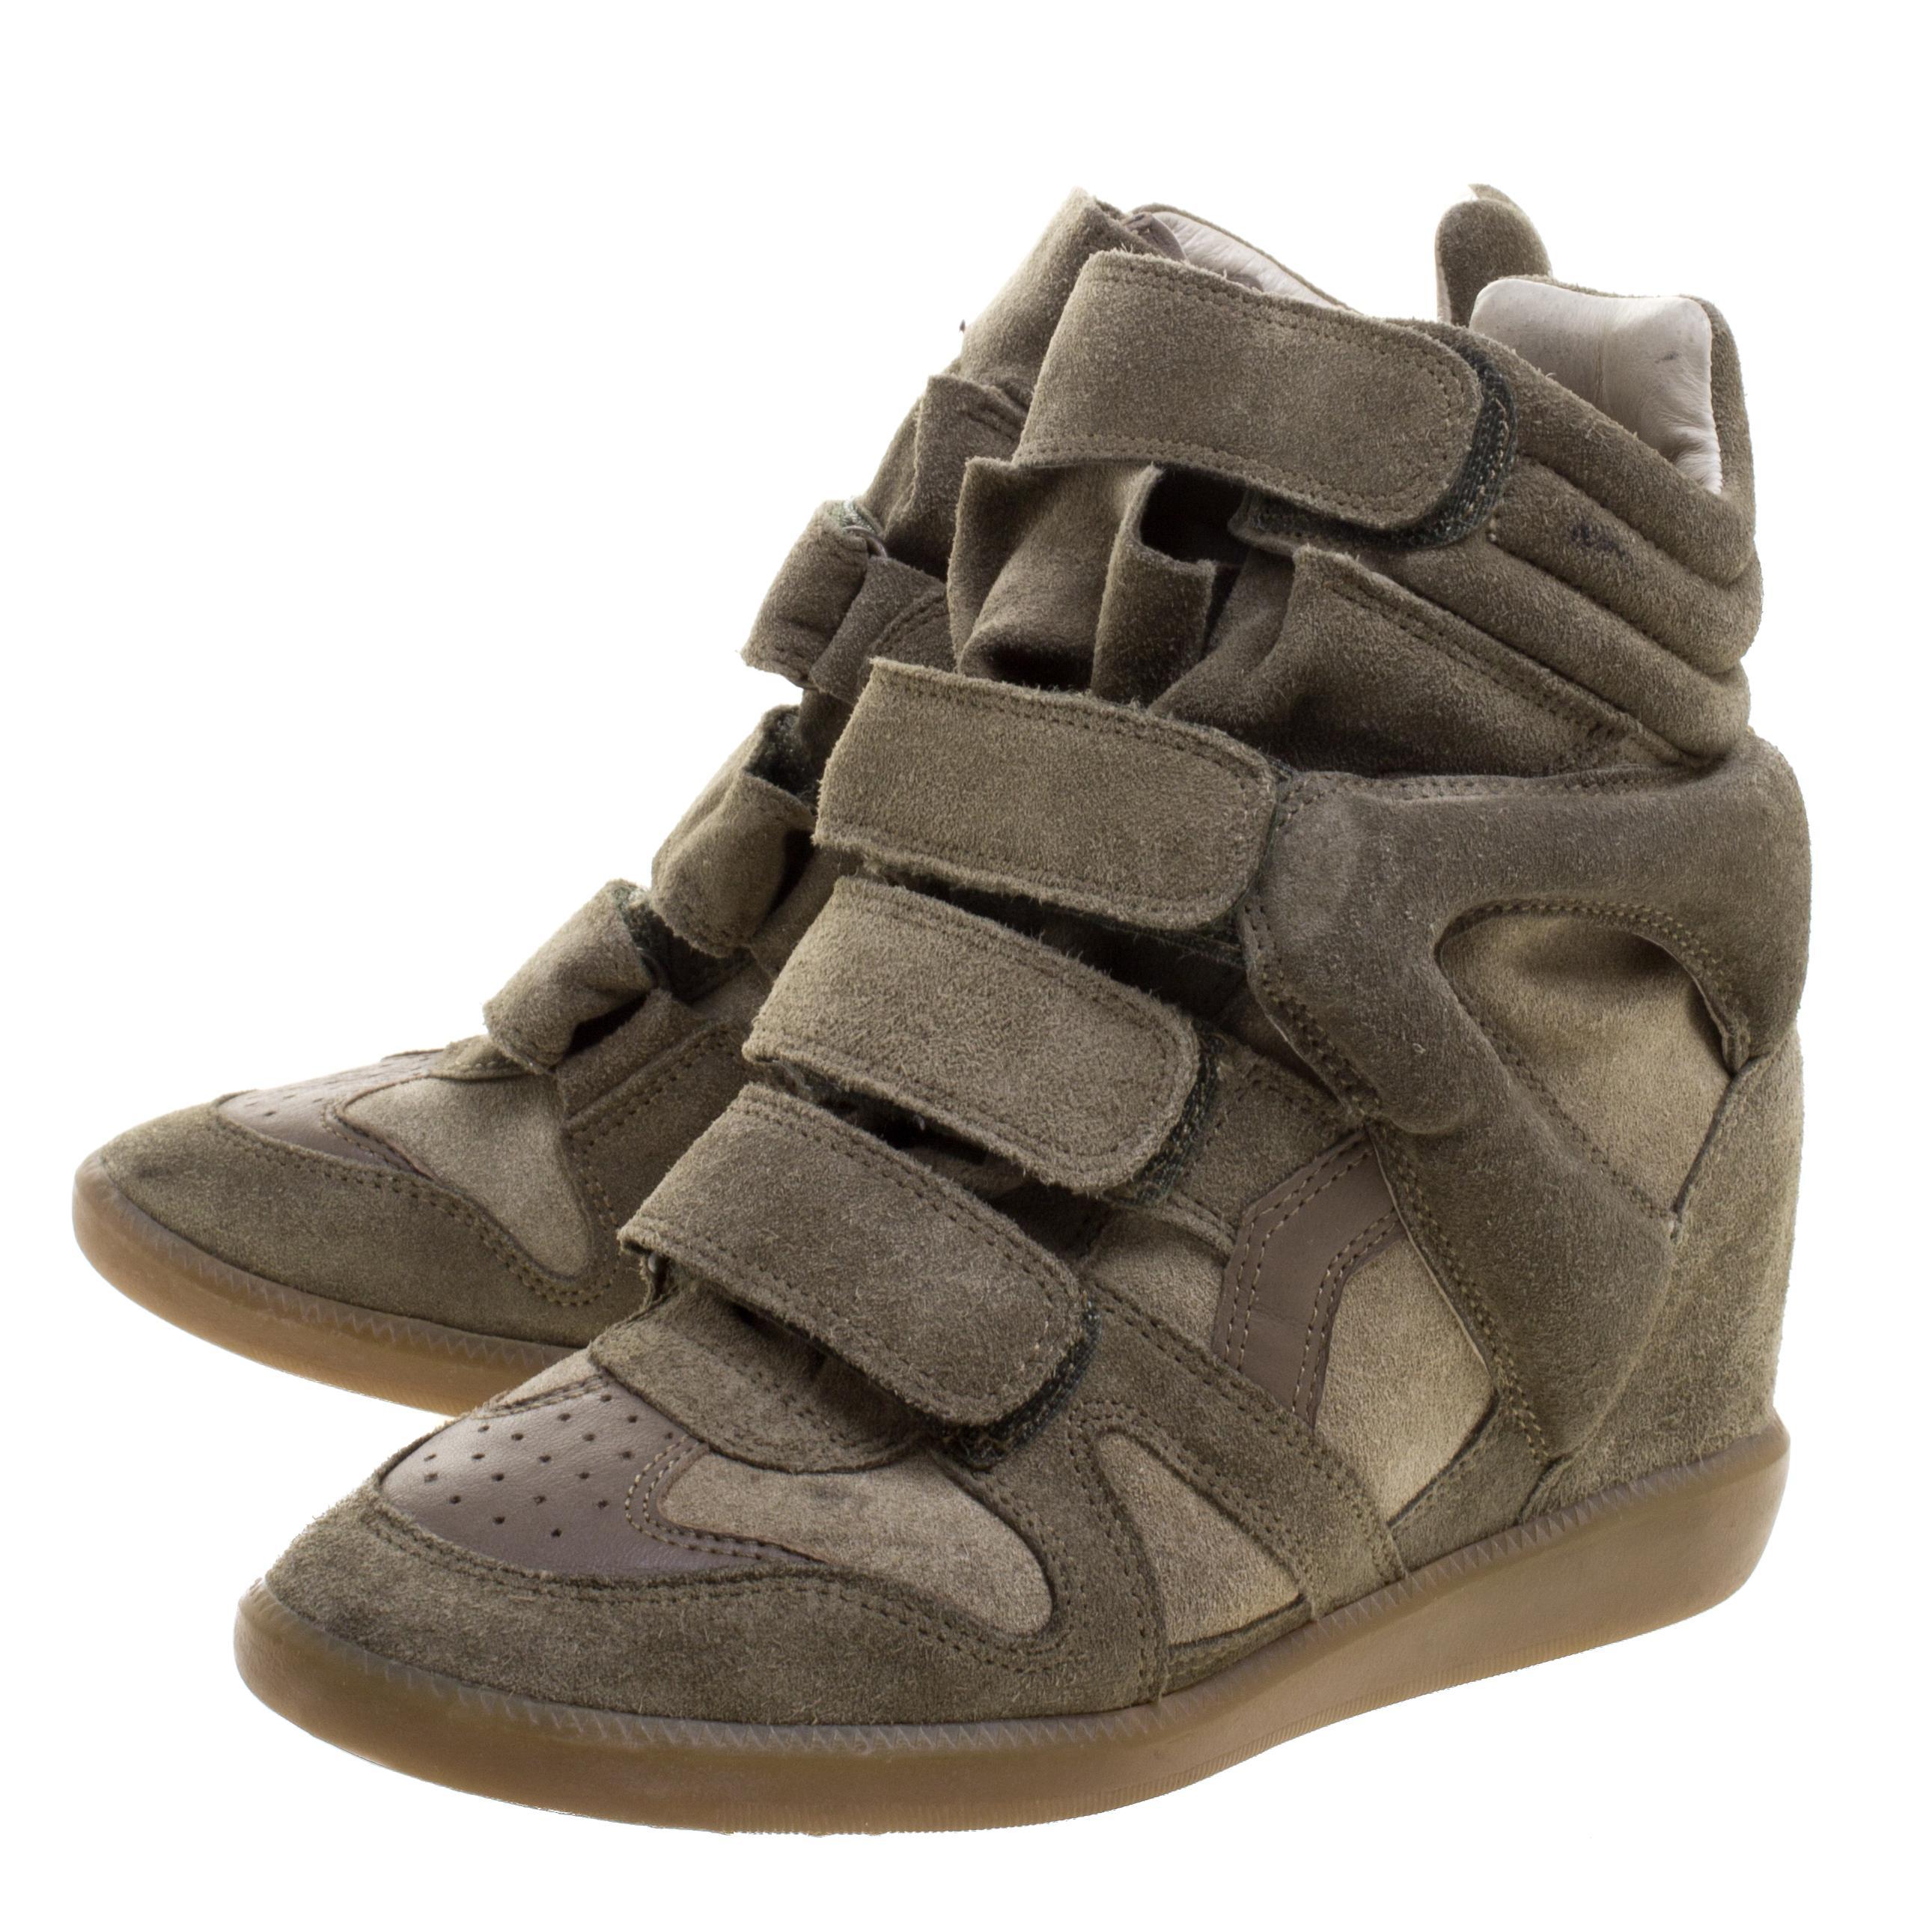 4ef3a02277 Isabel Marant 'bekett' Built-in Wedge Sneakers in Green - Save 27% - Lyst